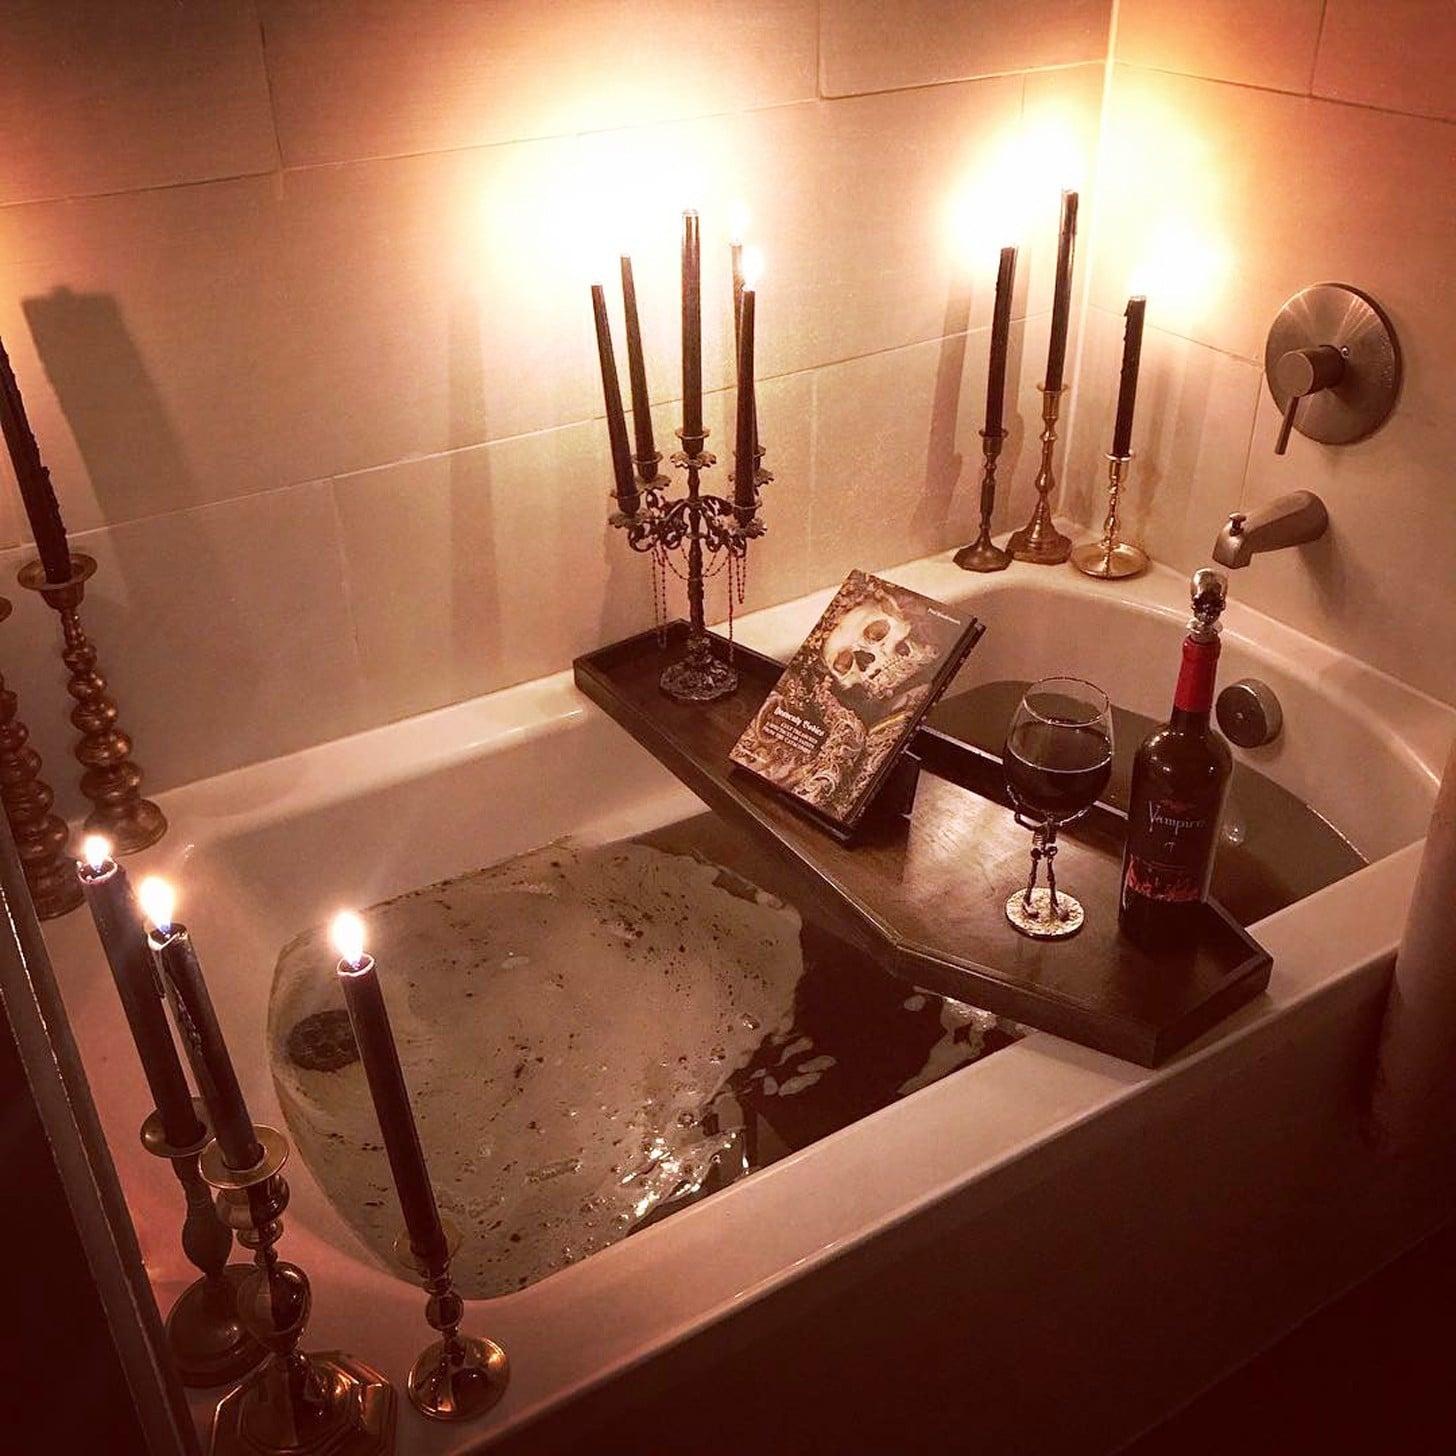 Coffin-Shaped Bath Tray | POPSUGAR Beauty